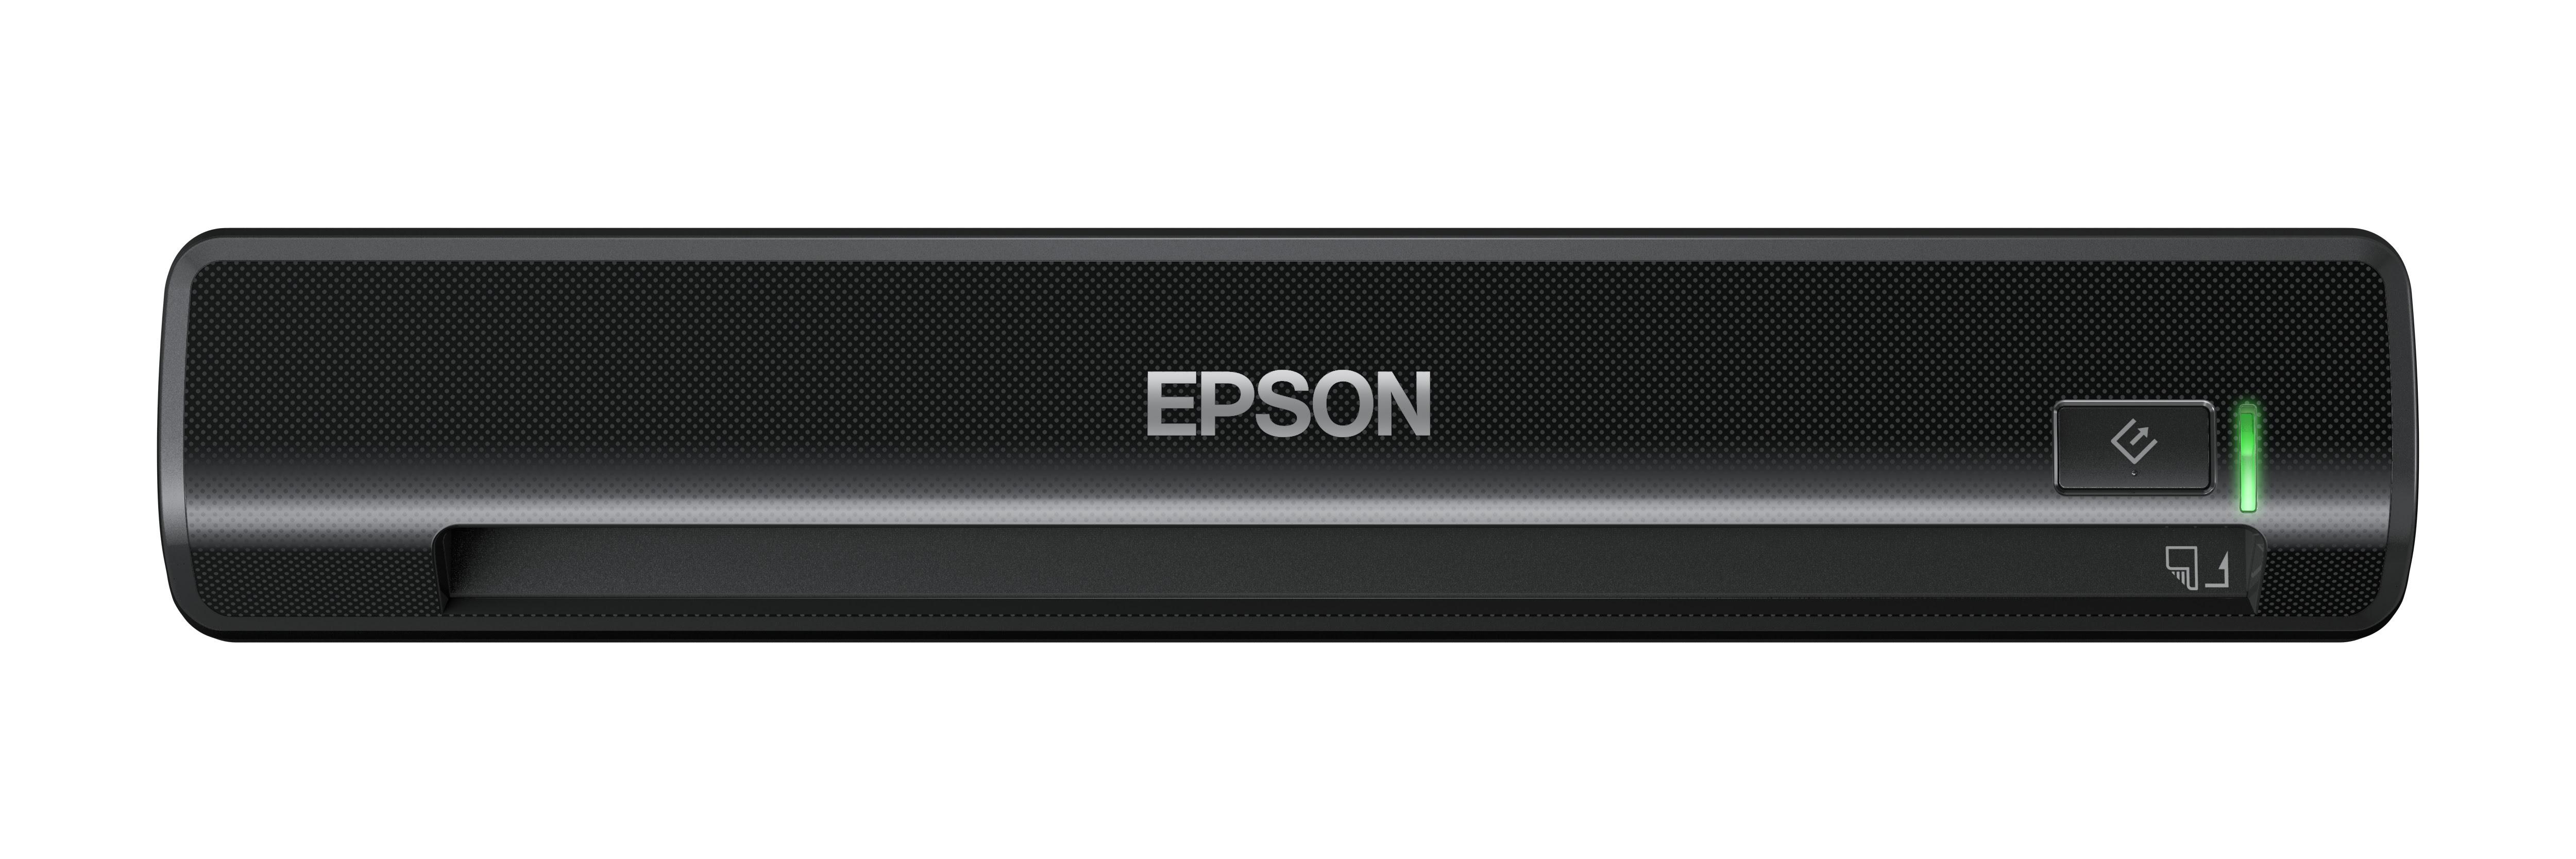 Media Library Epson Ca